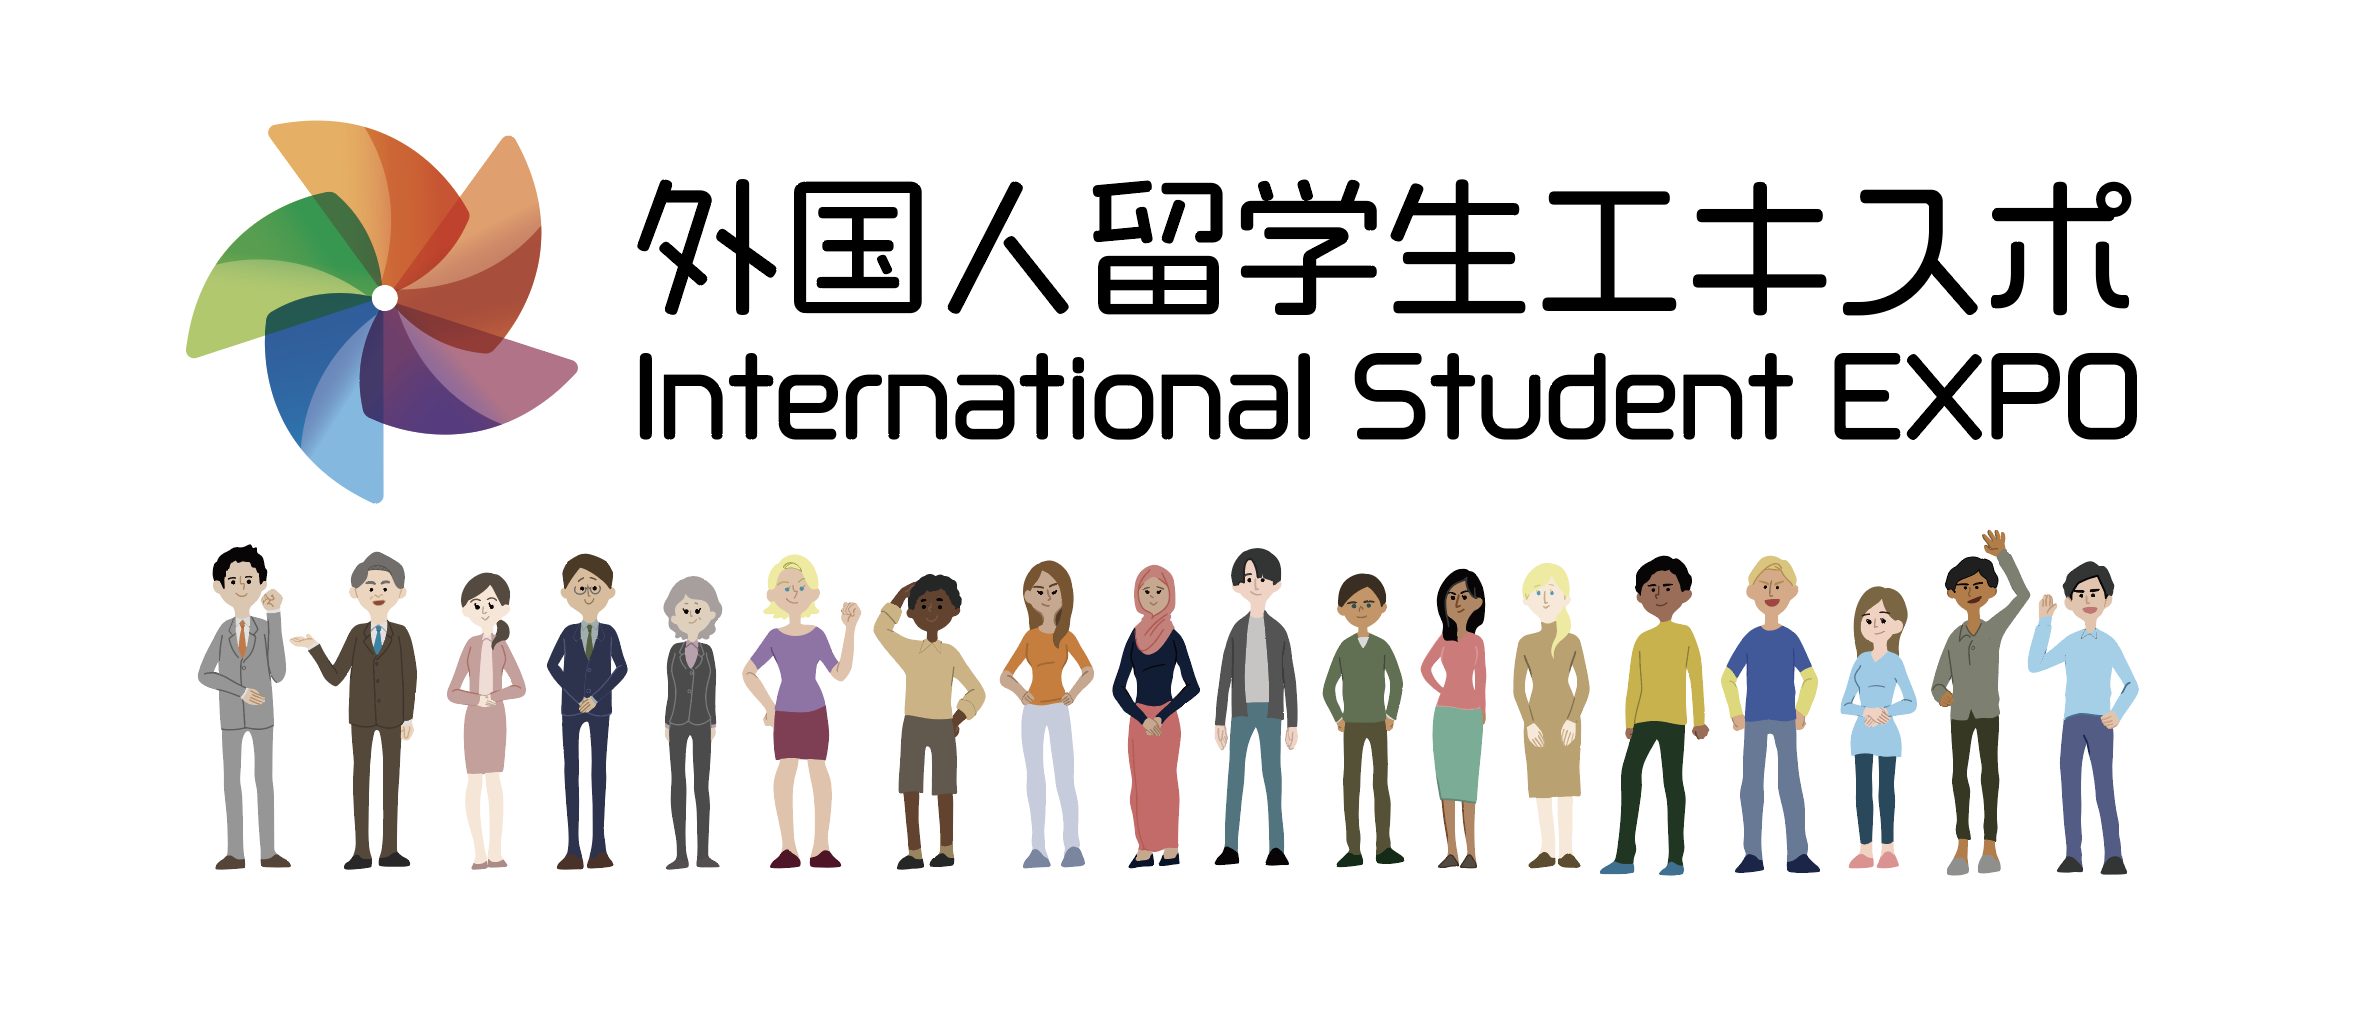 外国人留学生エキスポ来場者登録開始!